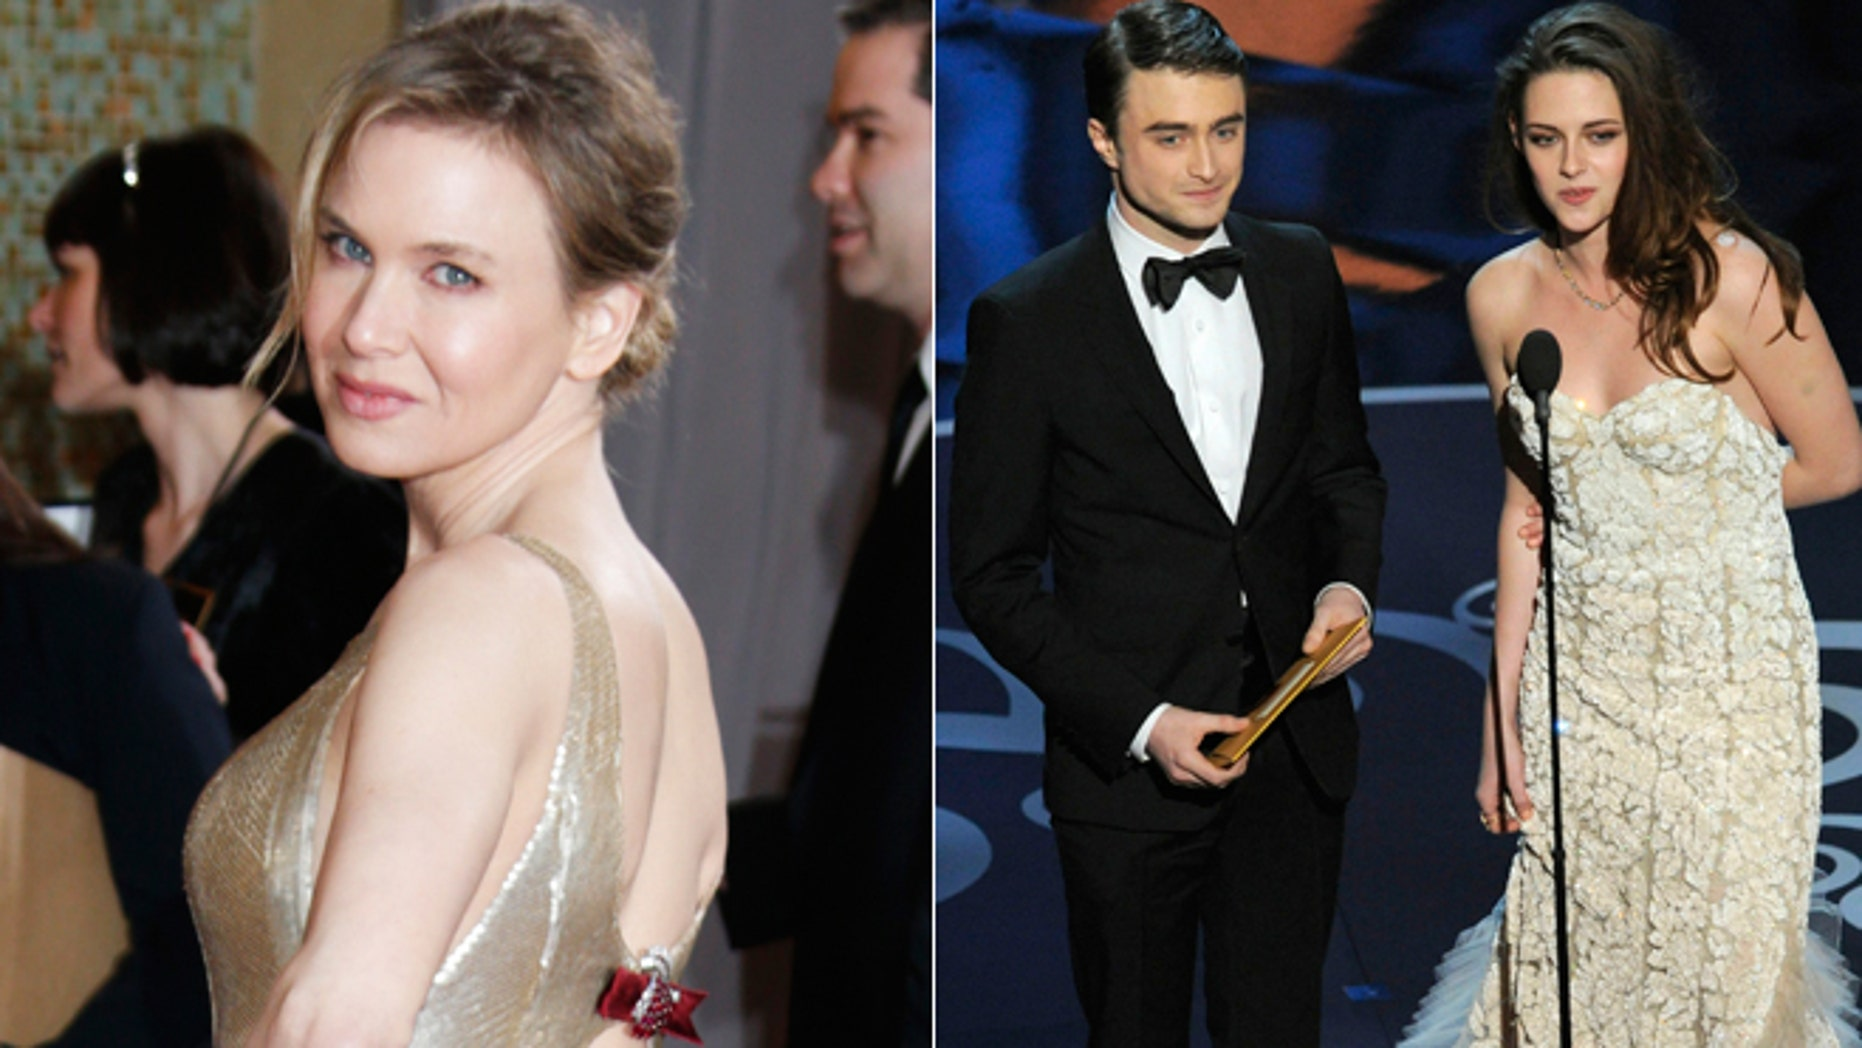 Renee Zellweger, left, and Kristen Stewart, right, attend the Oscars.